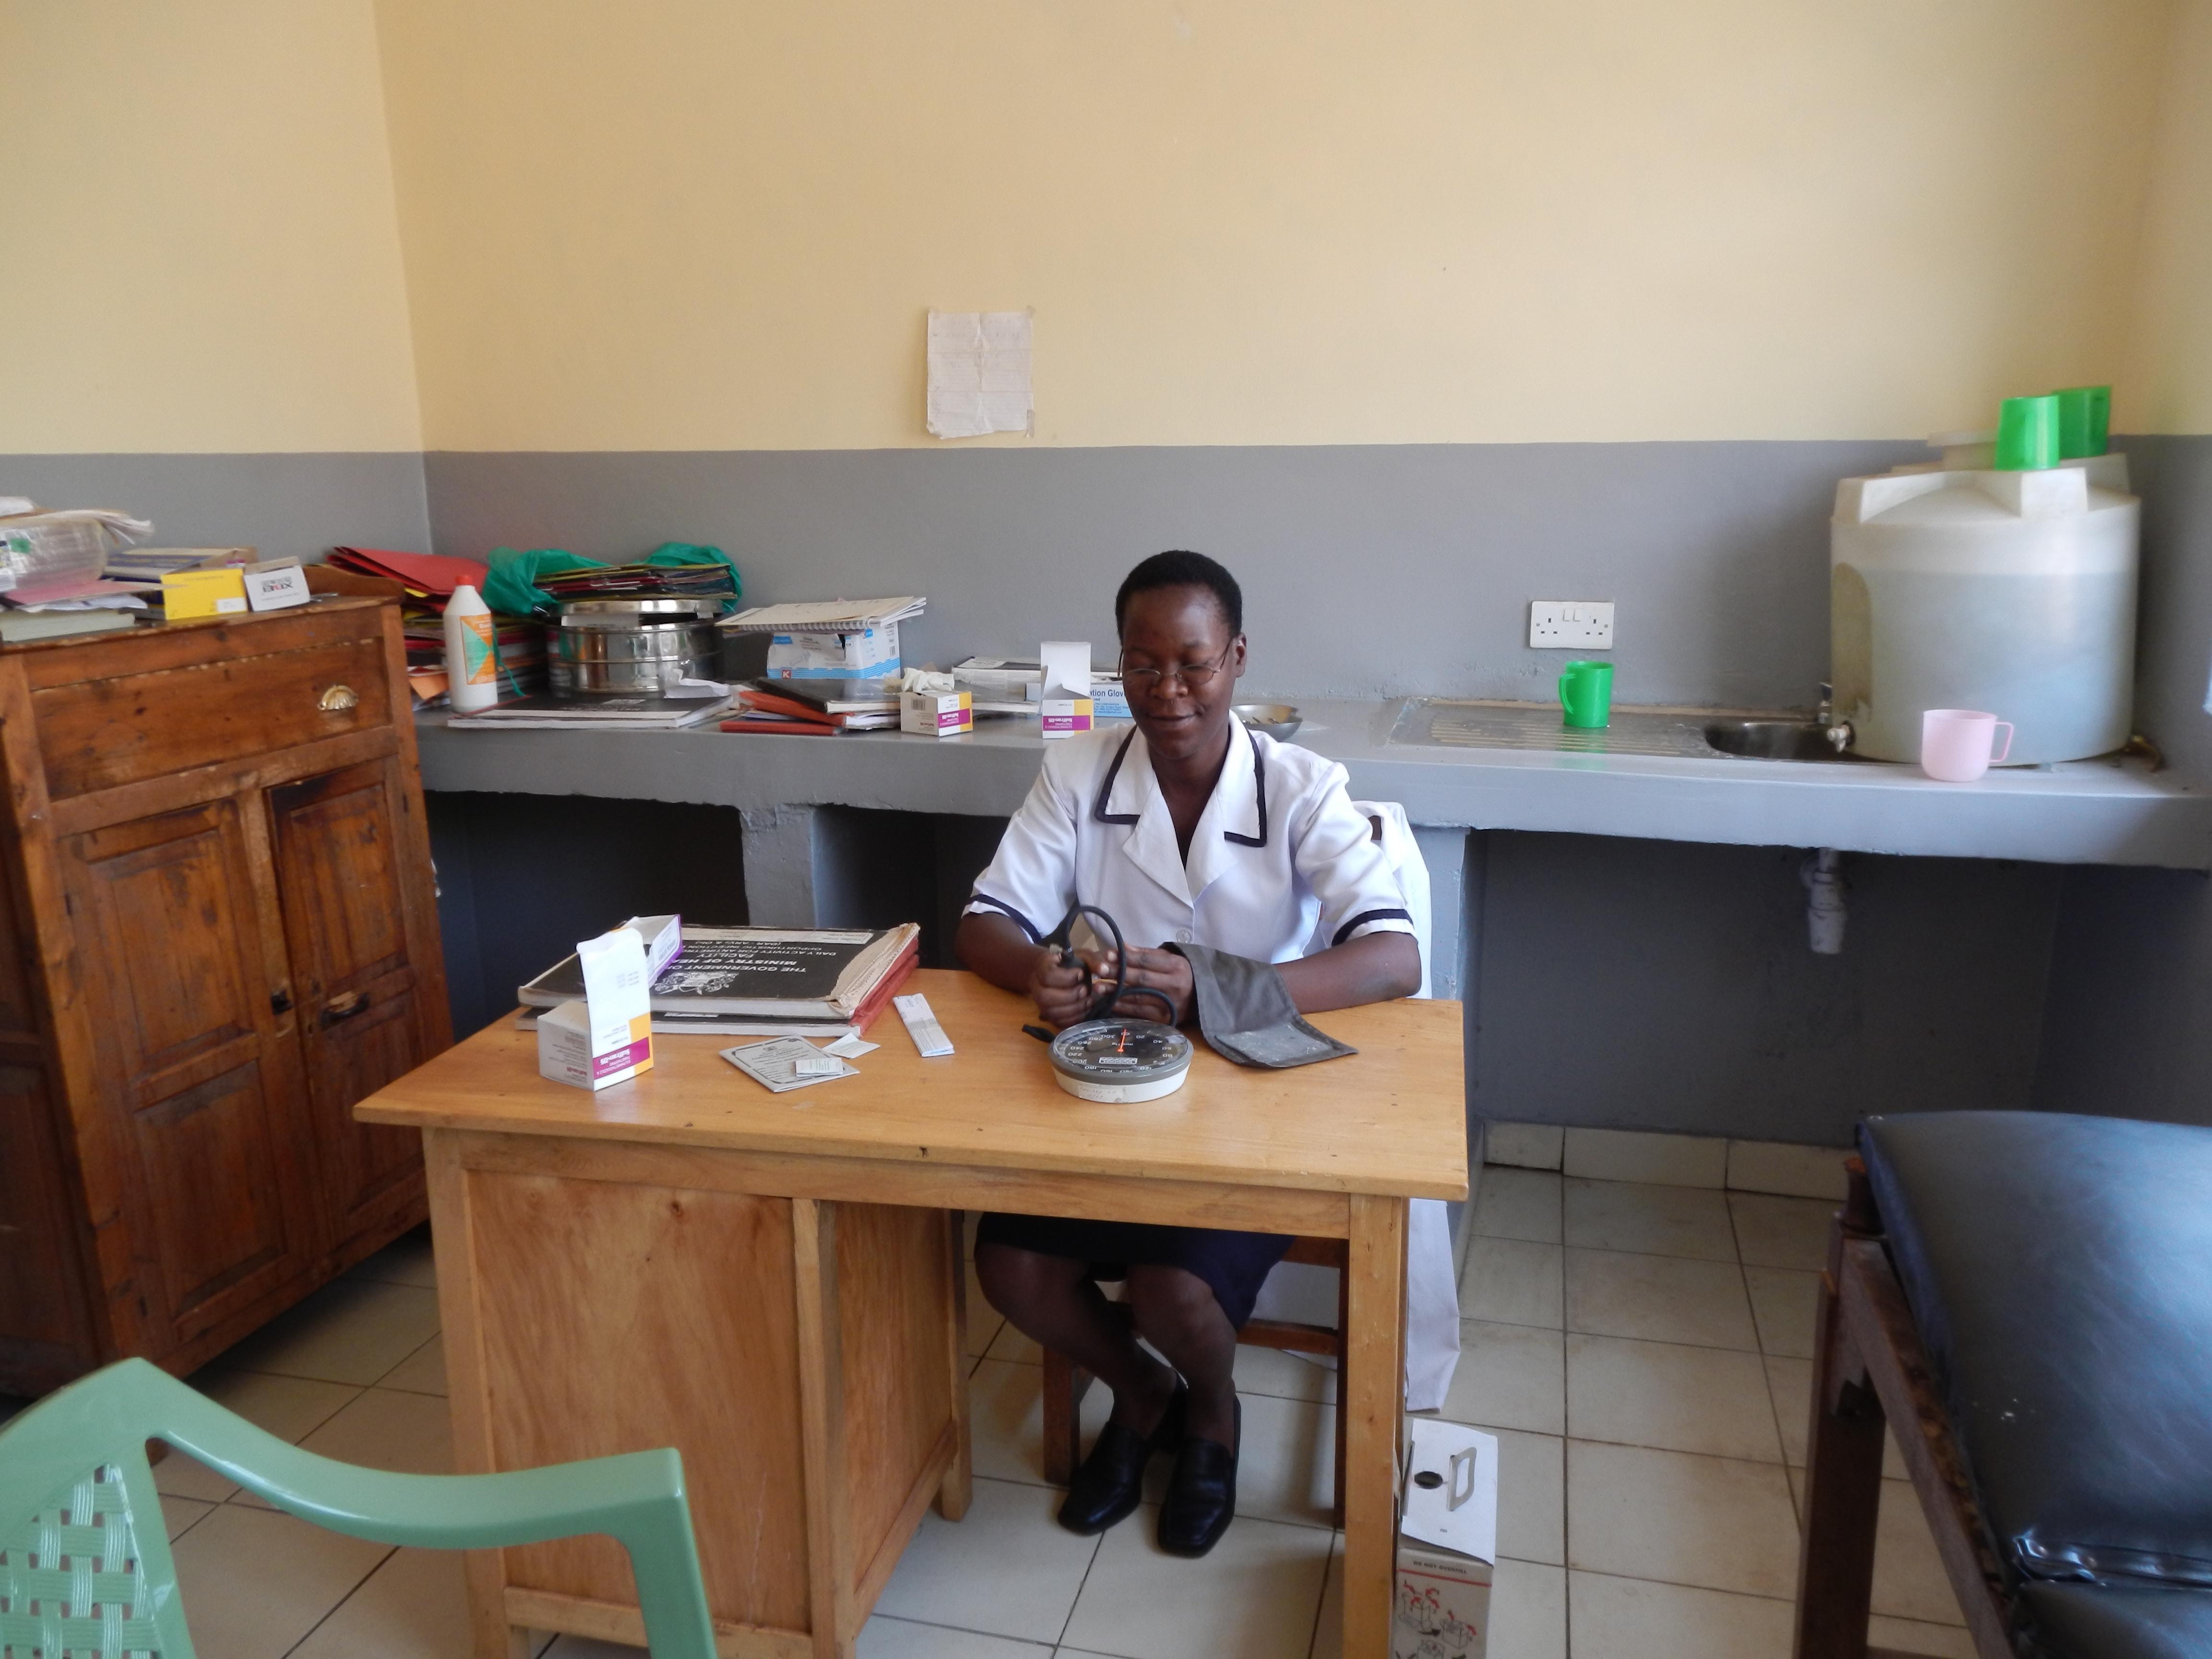 Consultation/examination room